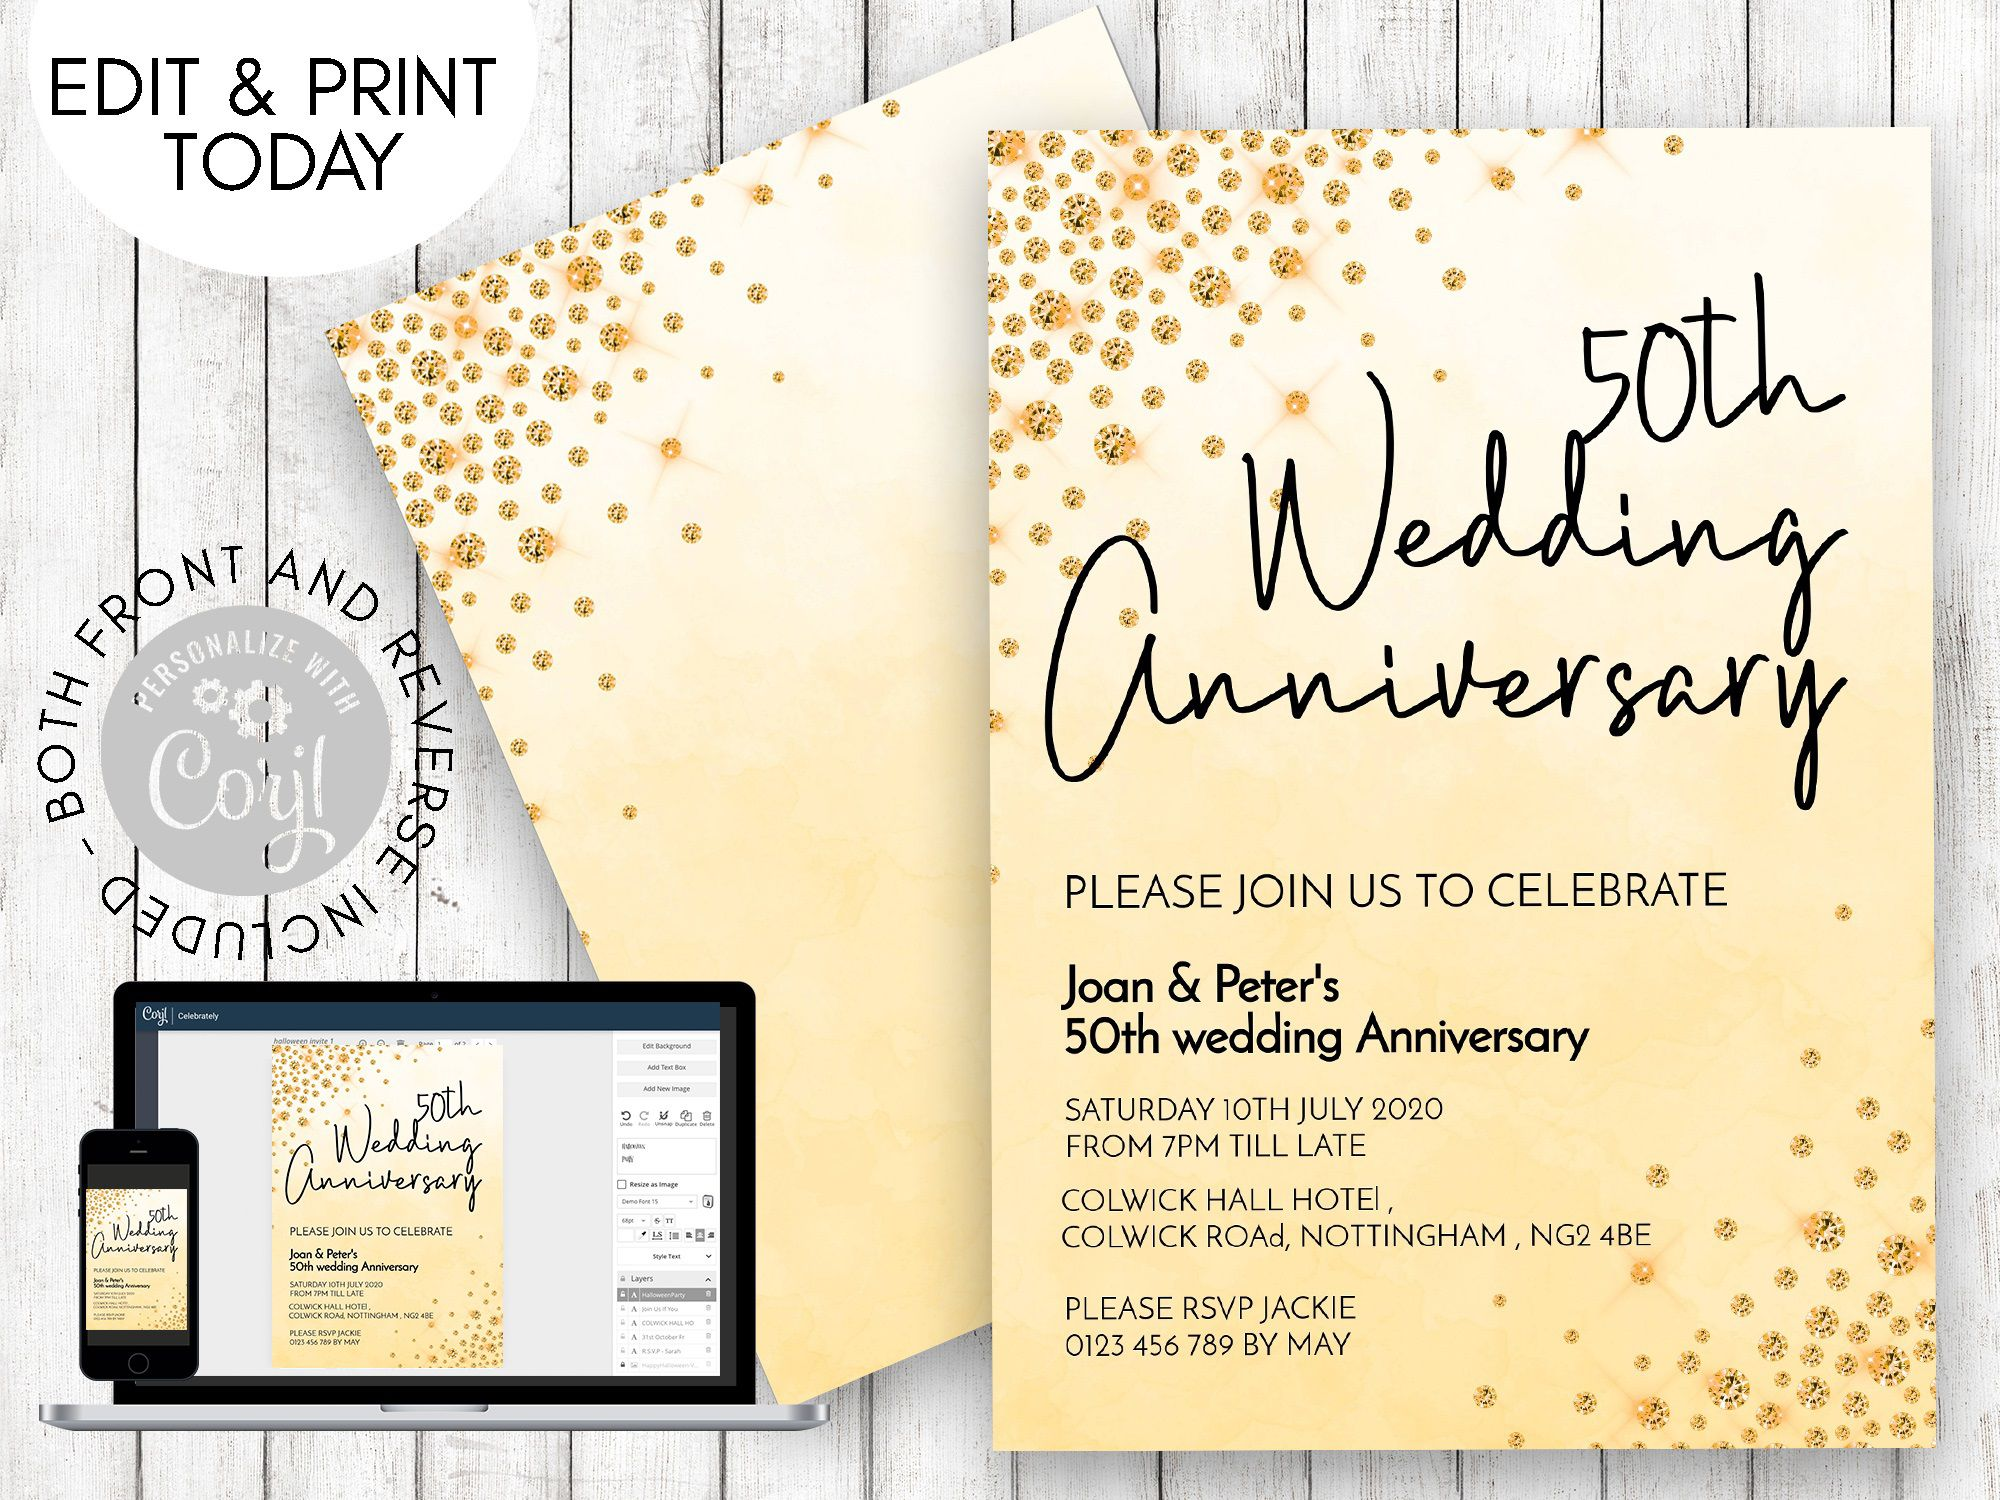 002 Sensational 50th Wedding Anniversary Invitation Template Free Download Inspiration  GoldenFull